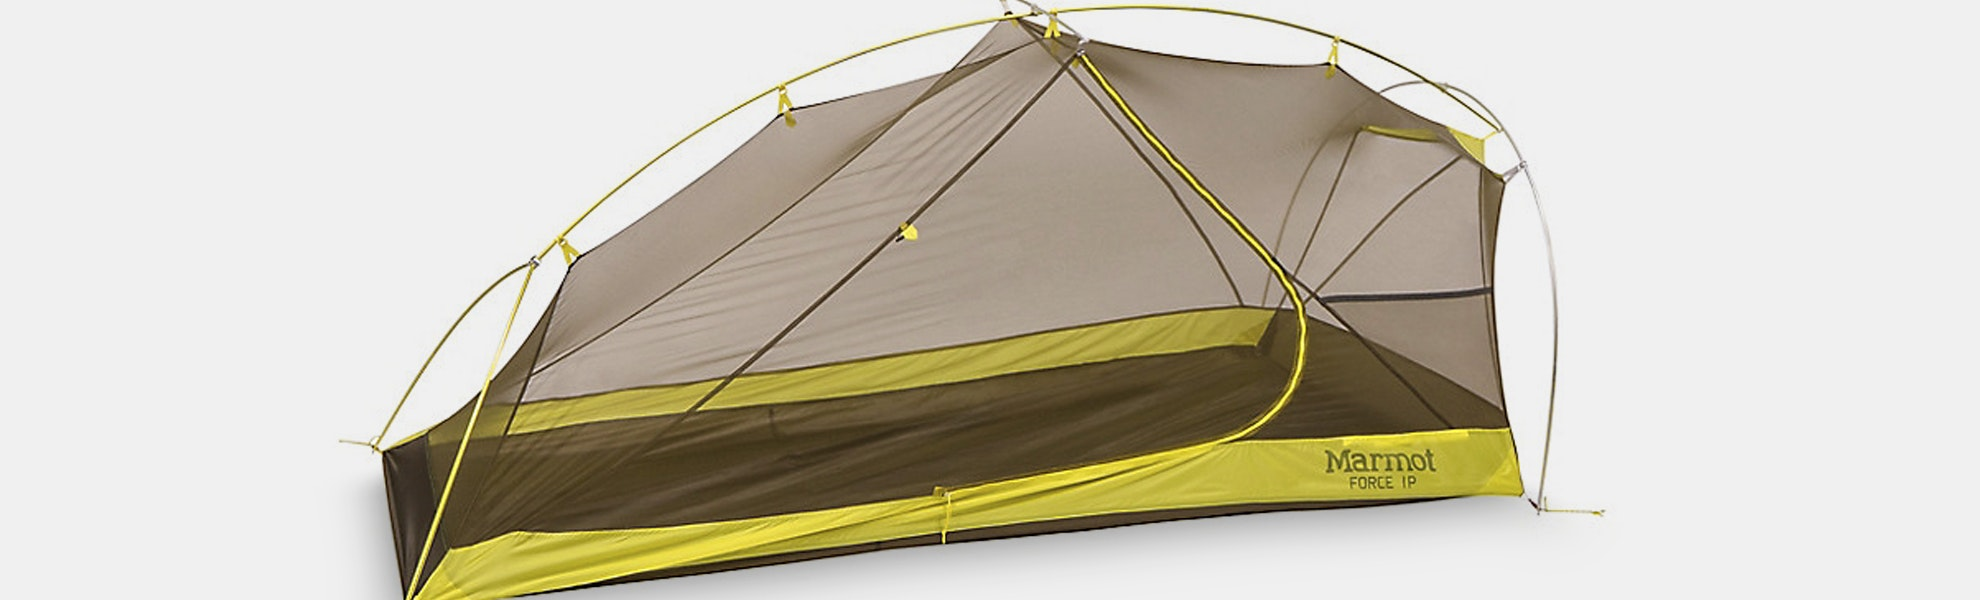 Marmot Force Series Tents